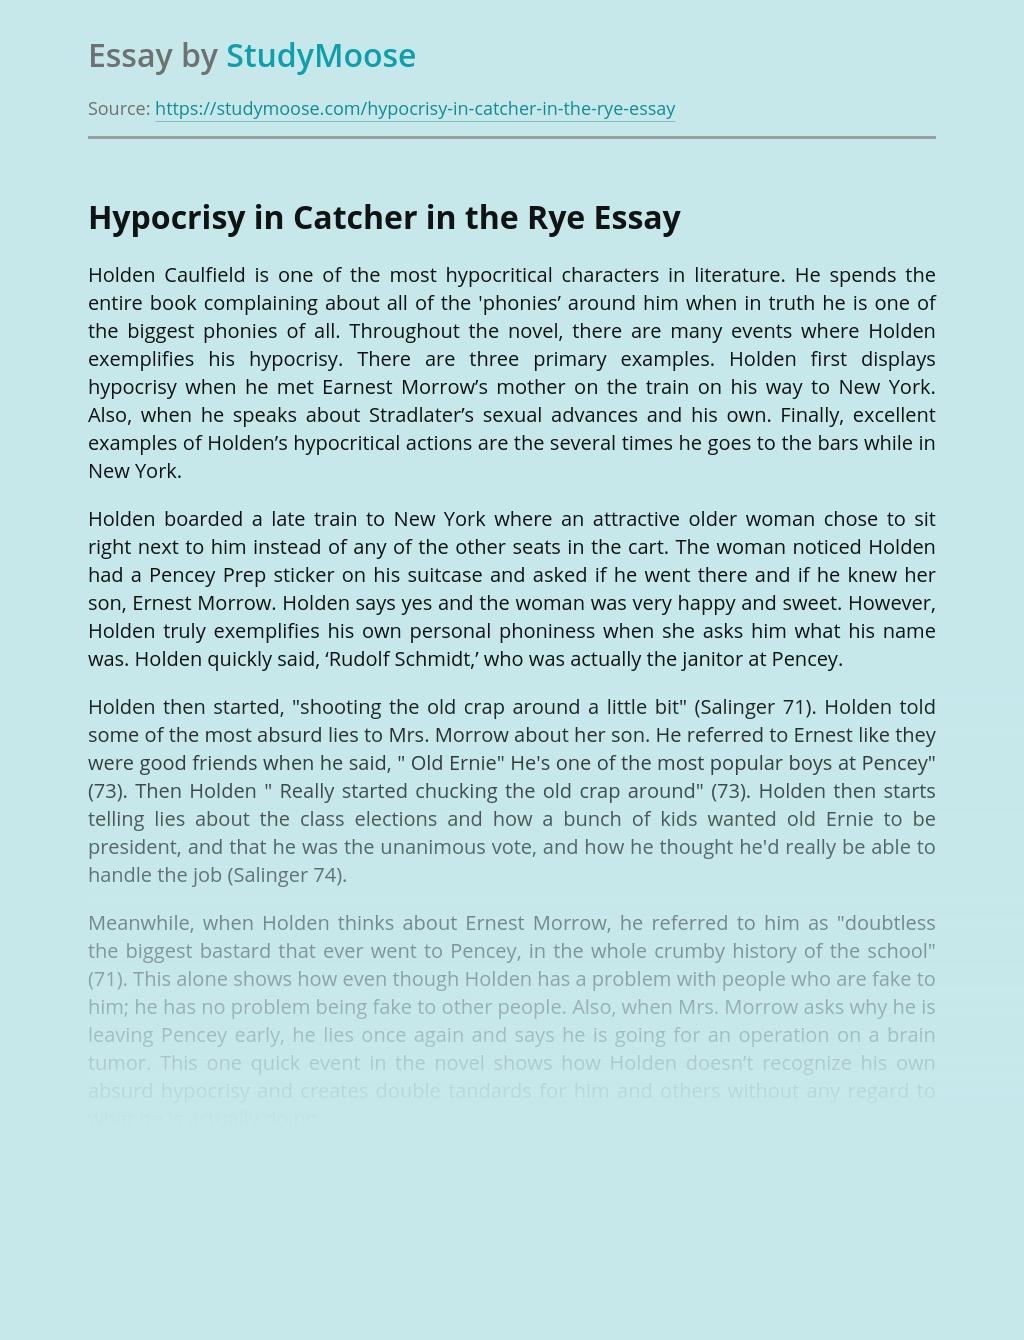 Hypocrisy in Catcher in the Rye